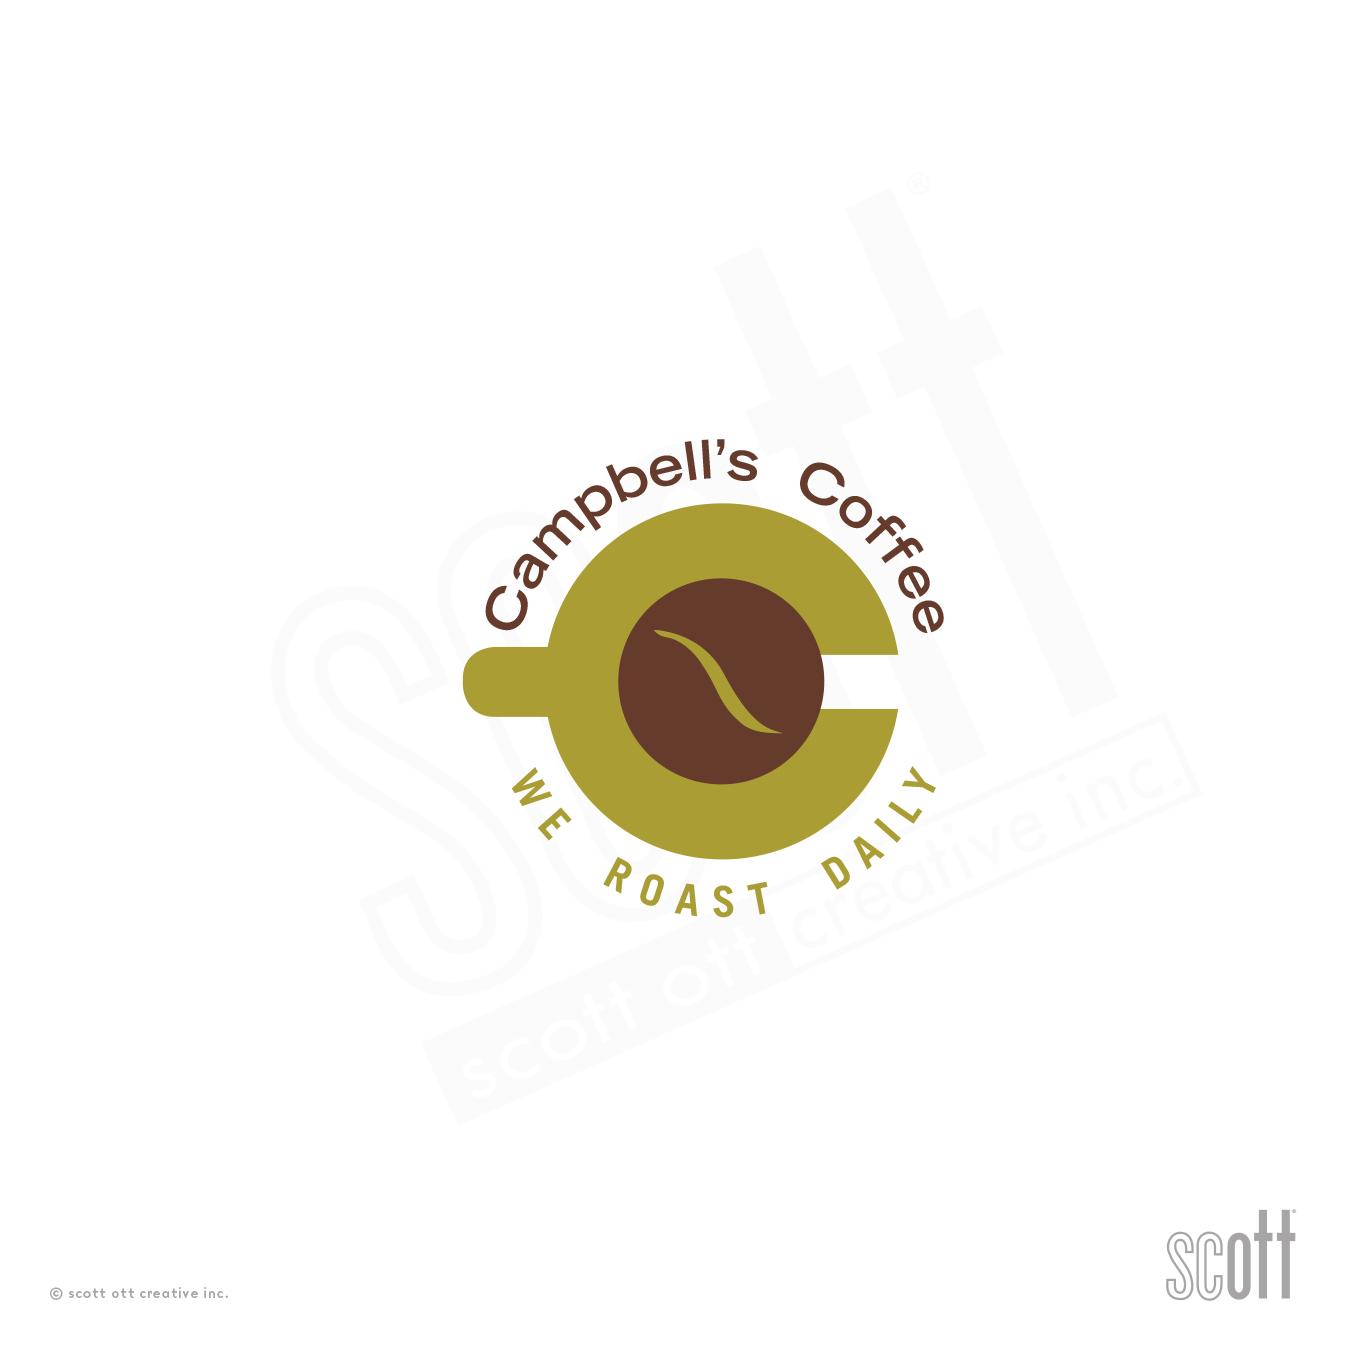 Campbell's_Coffee_LOGO_-_scott_ott_creat